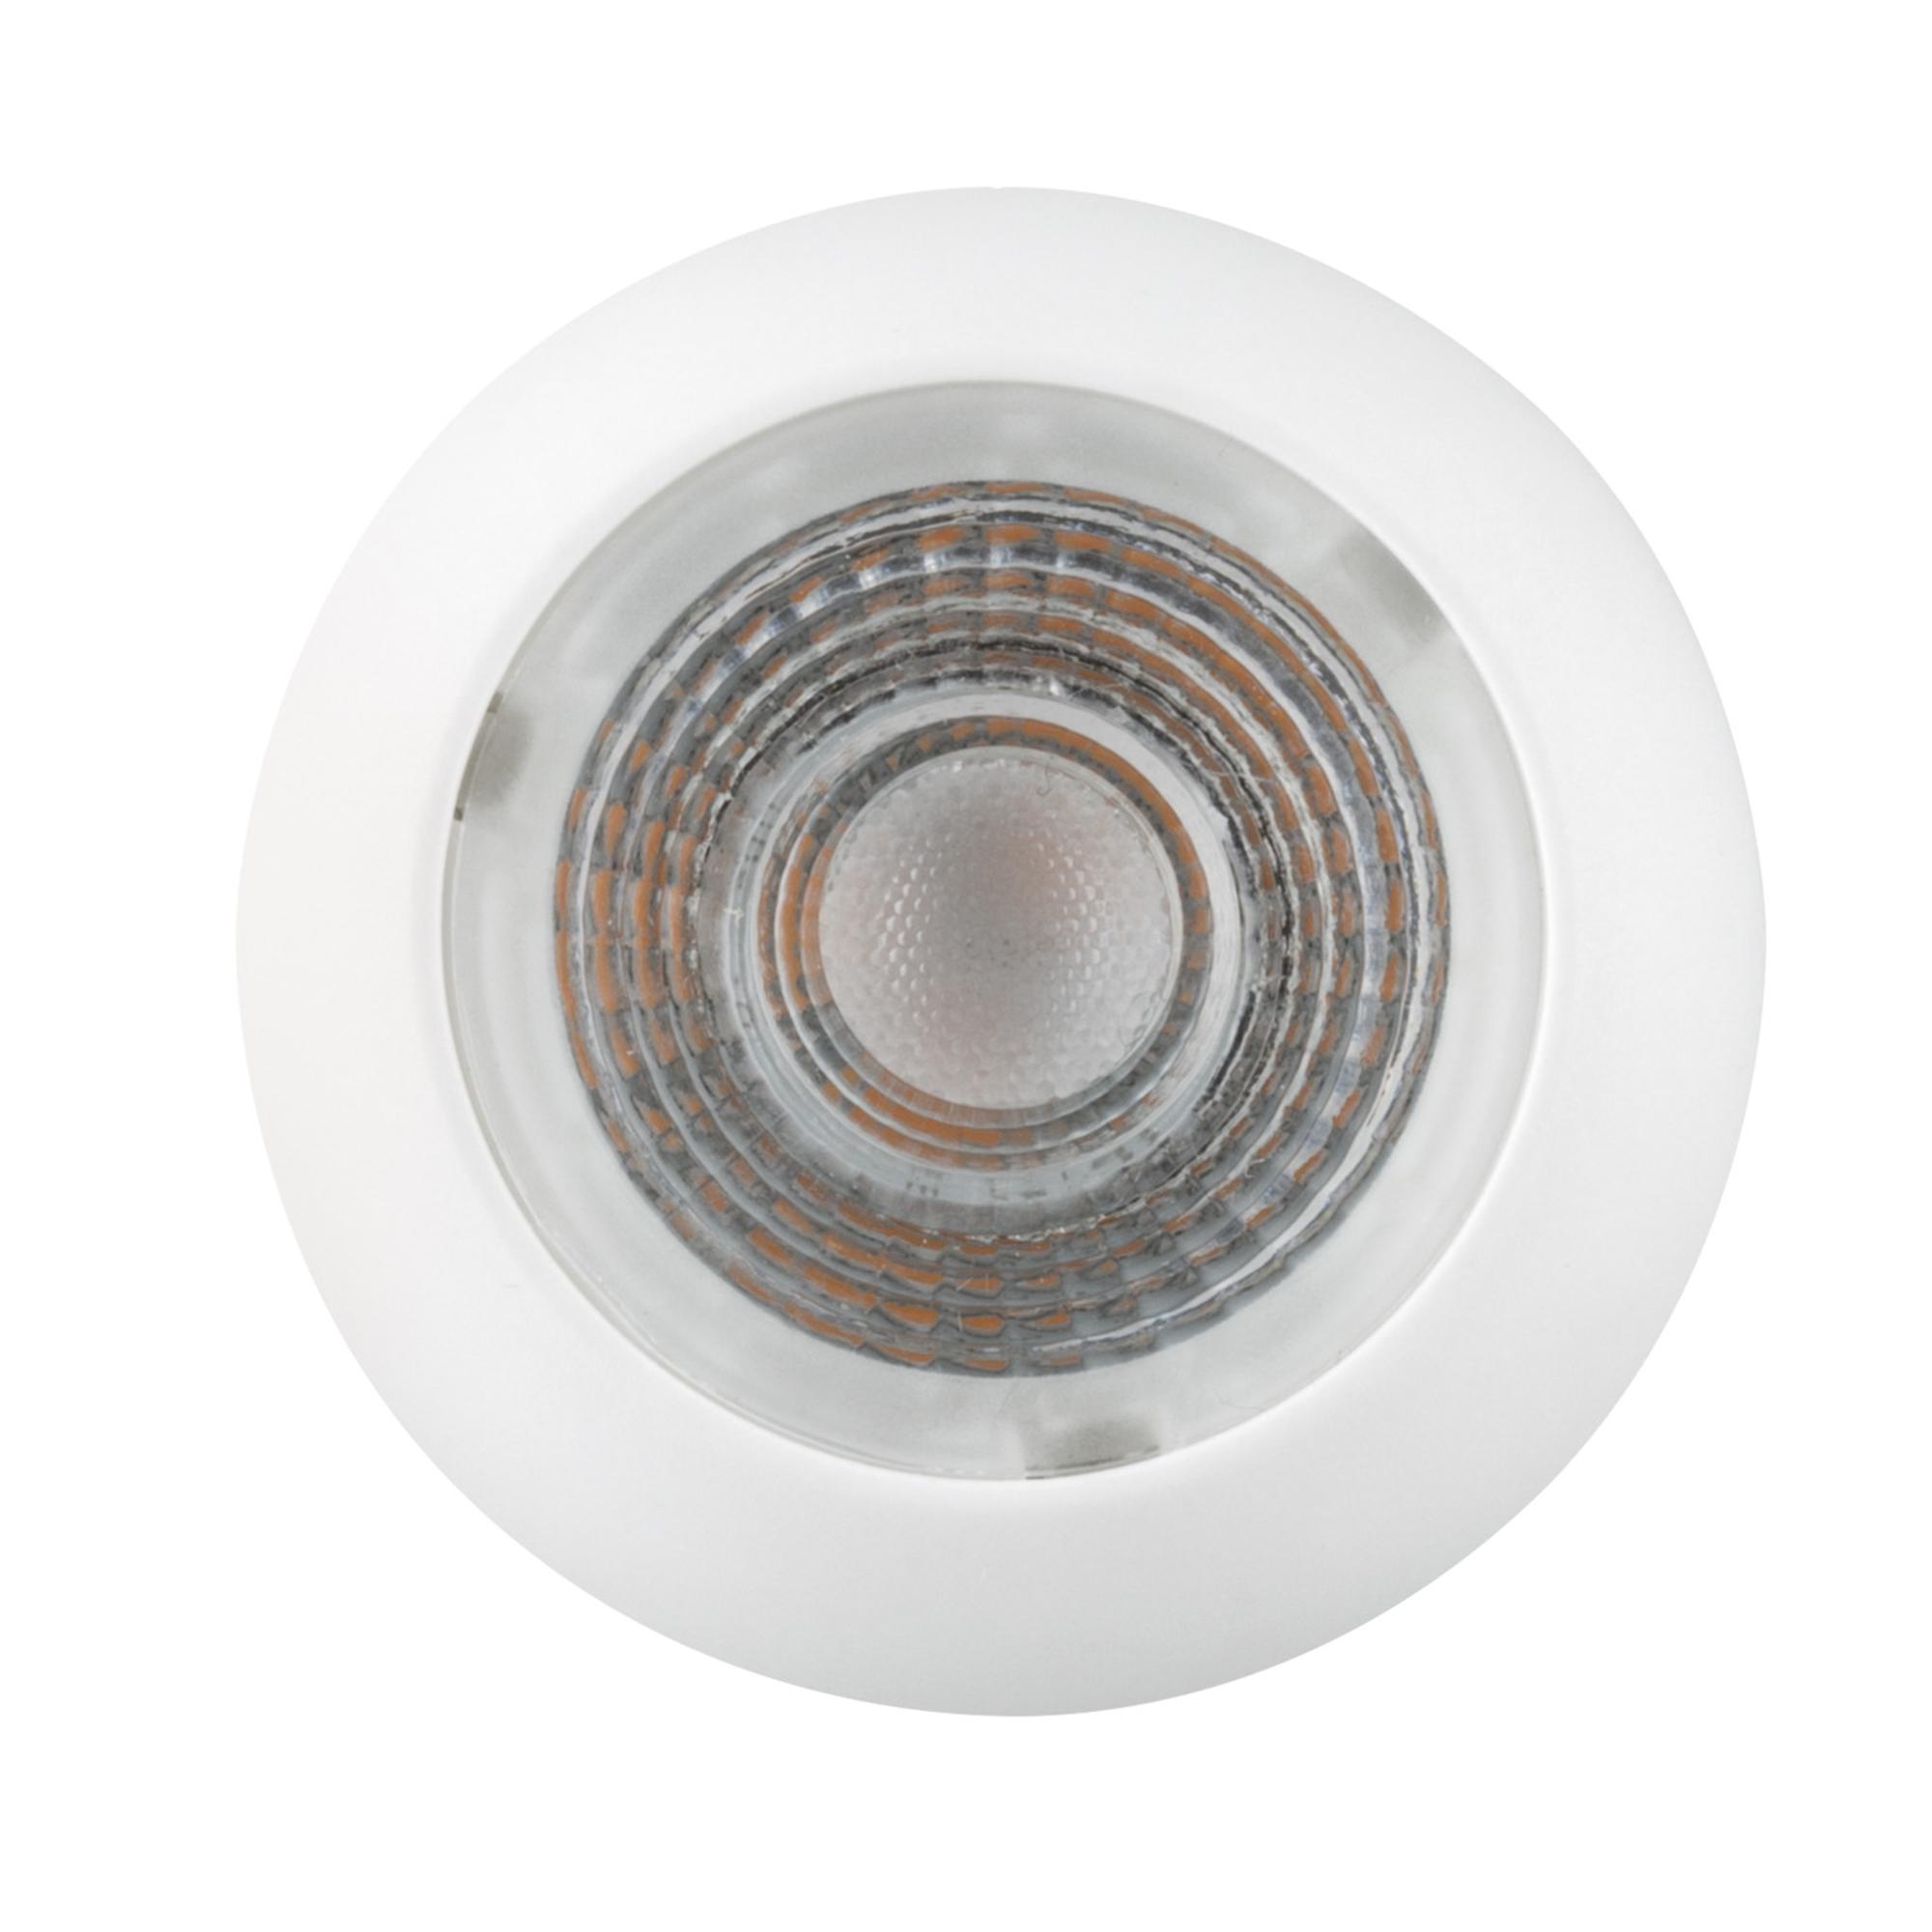 Лампа светодиодная Paulmann Рефлекторная R50 3.5Вт 230лм 2700K E14 230В Прозрачный 28460.